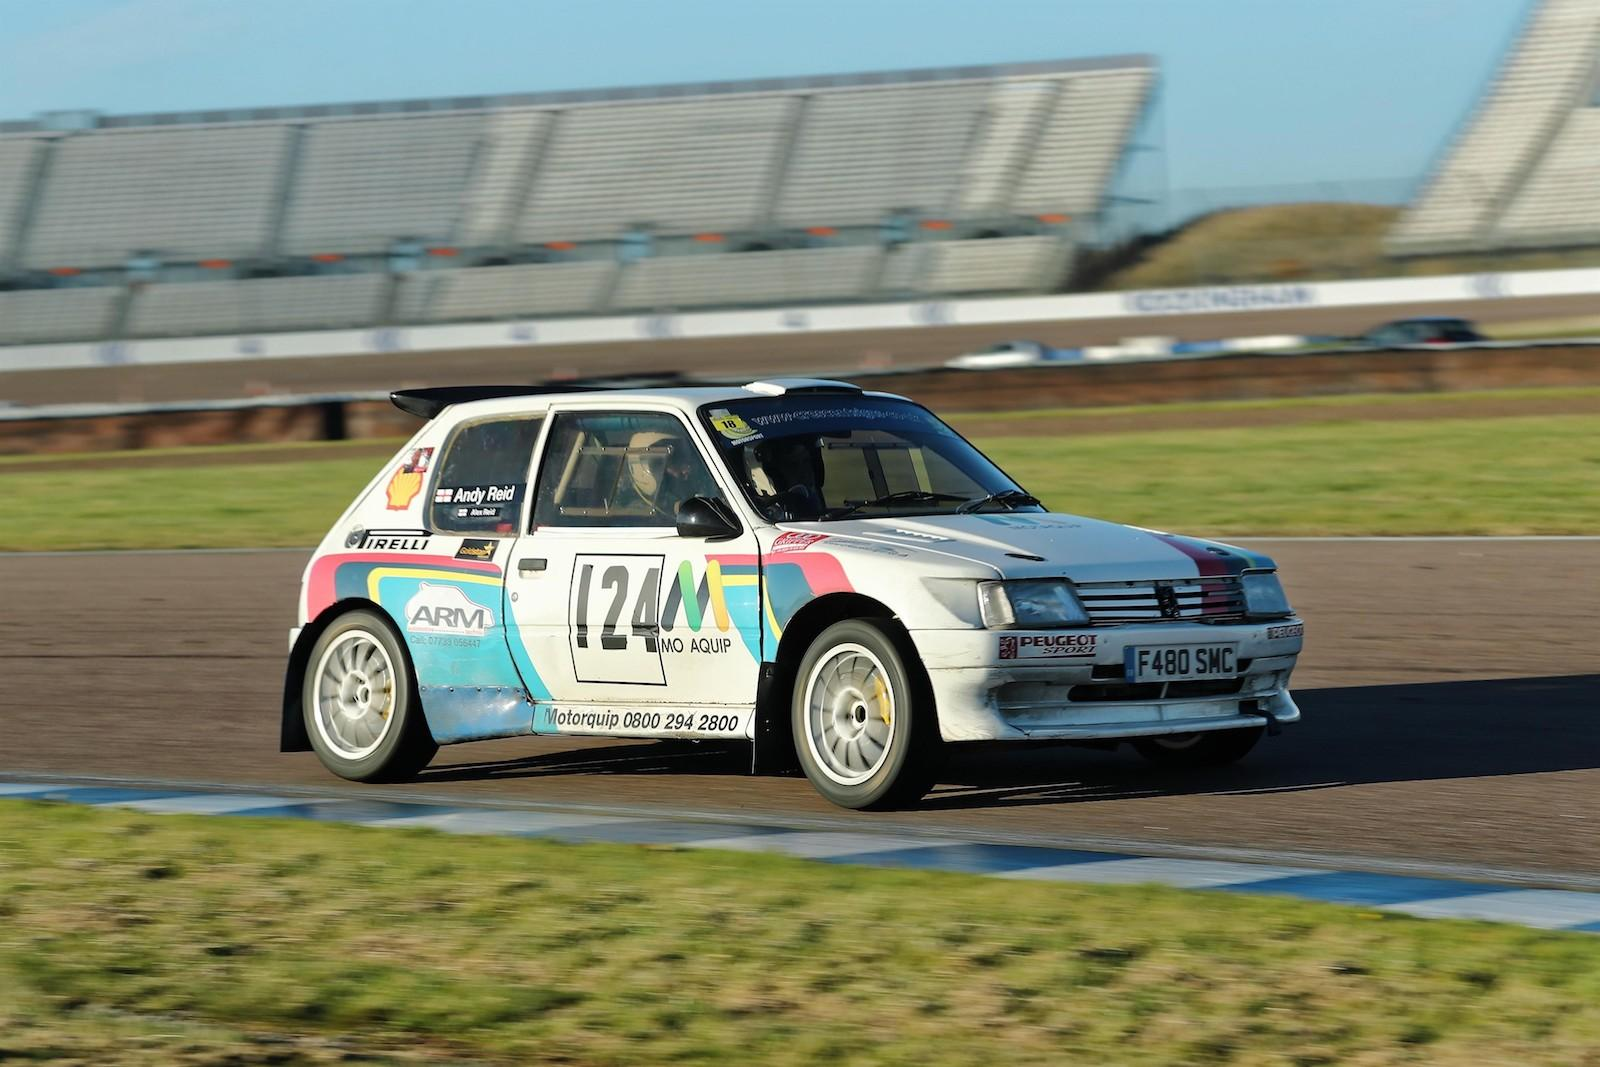 Rally heroes: Andy Reid's Peugeot 205 Maxi